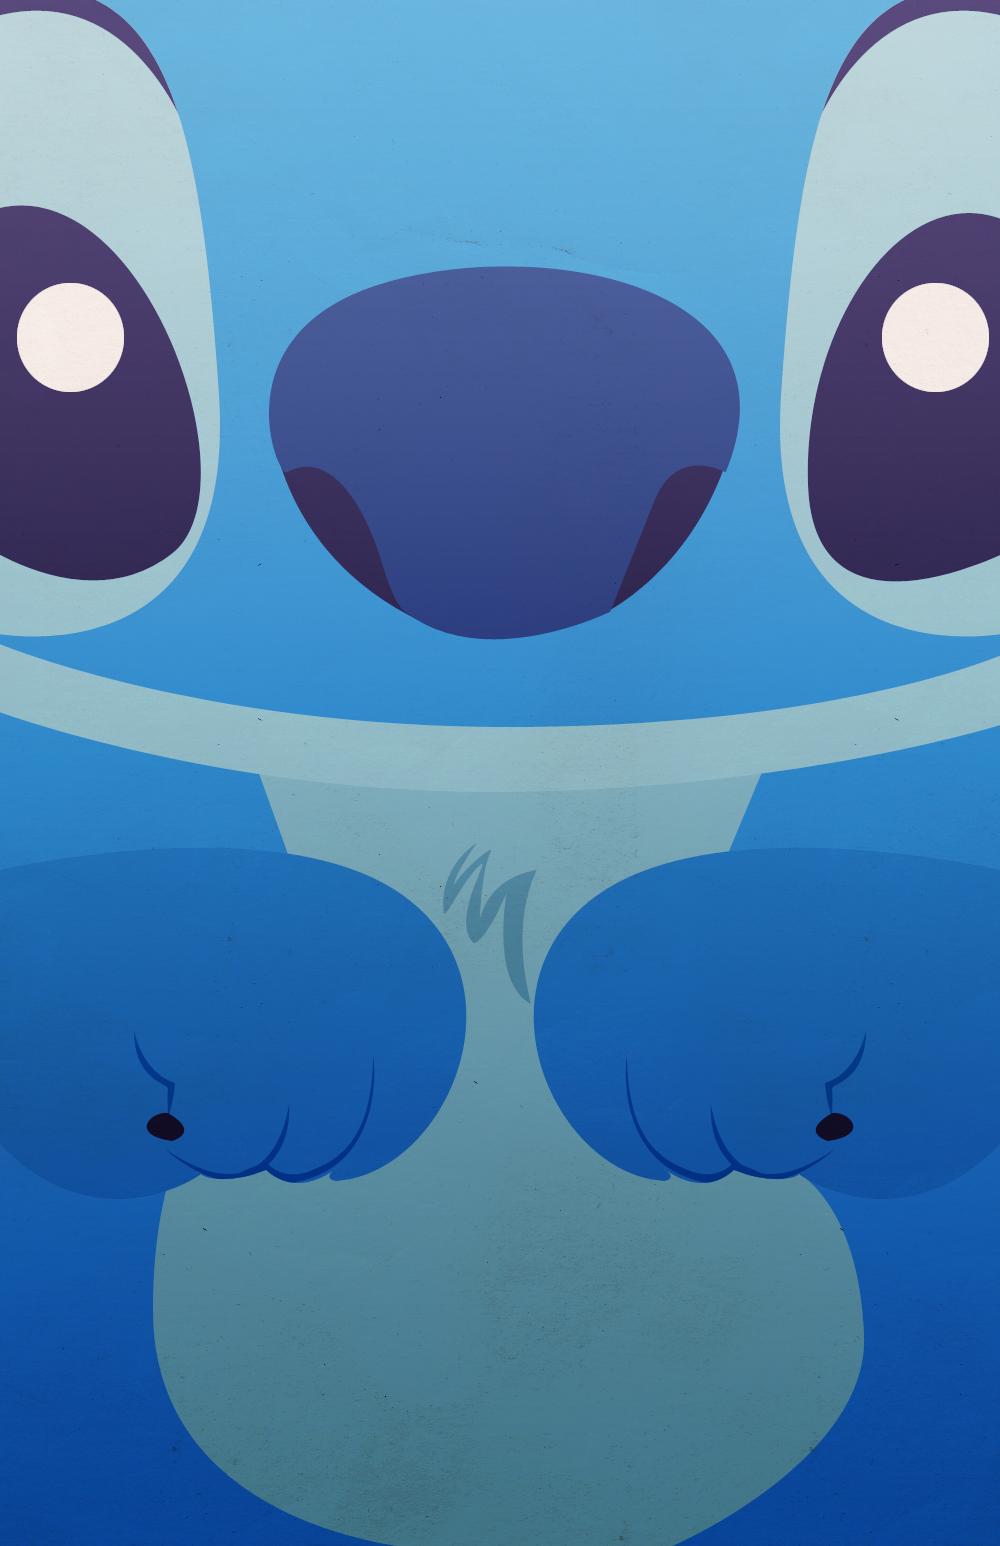 Disney Animals Part 1 Simple Phone Backgrounds By Petitetiaras